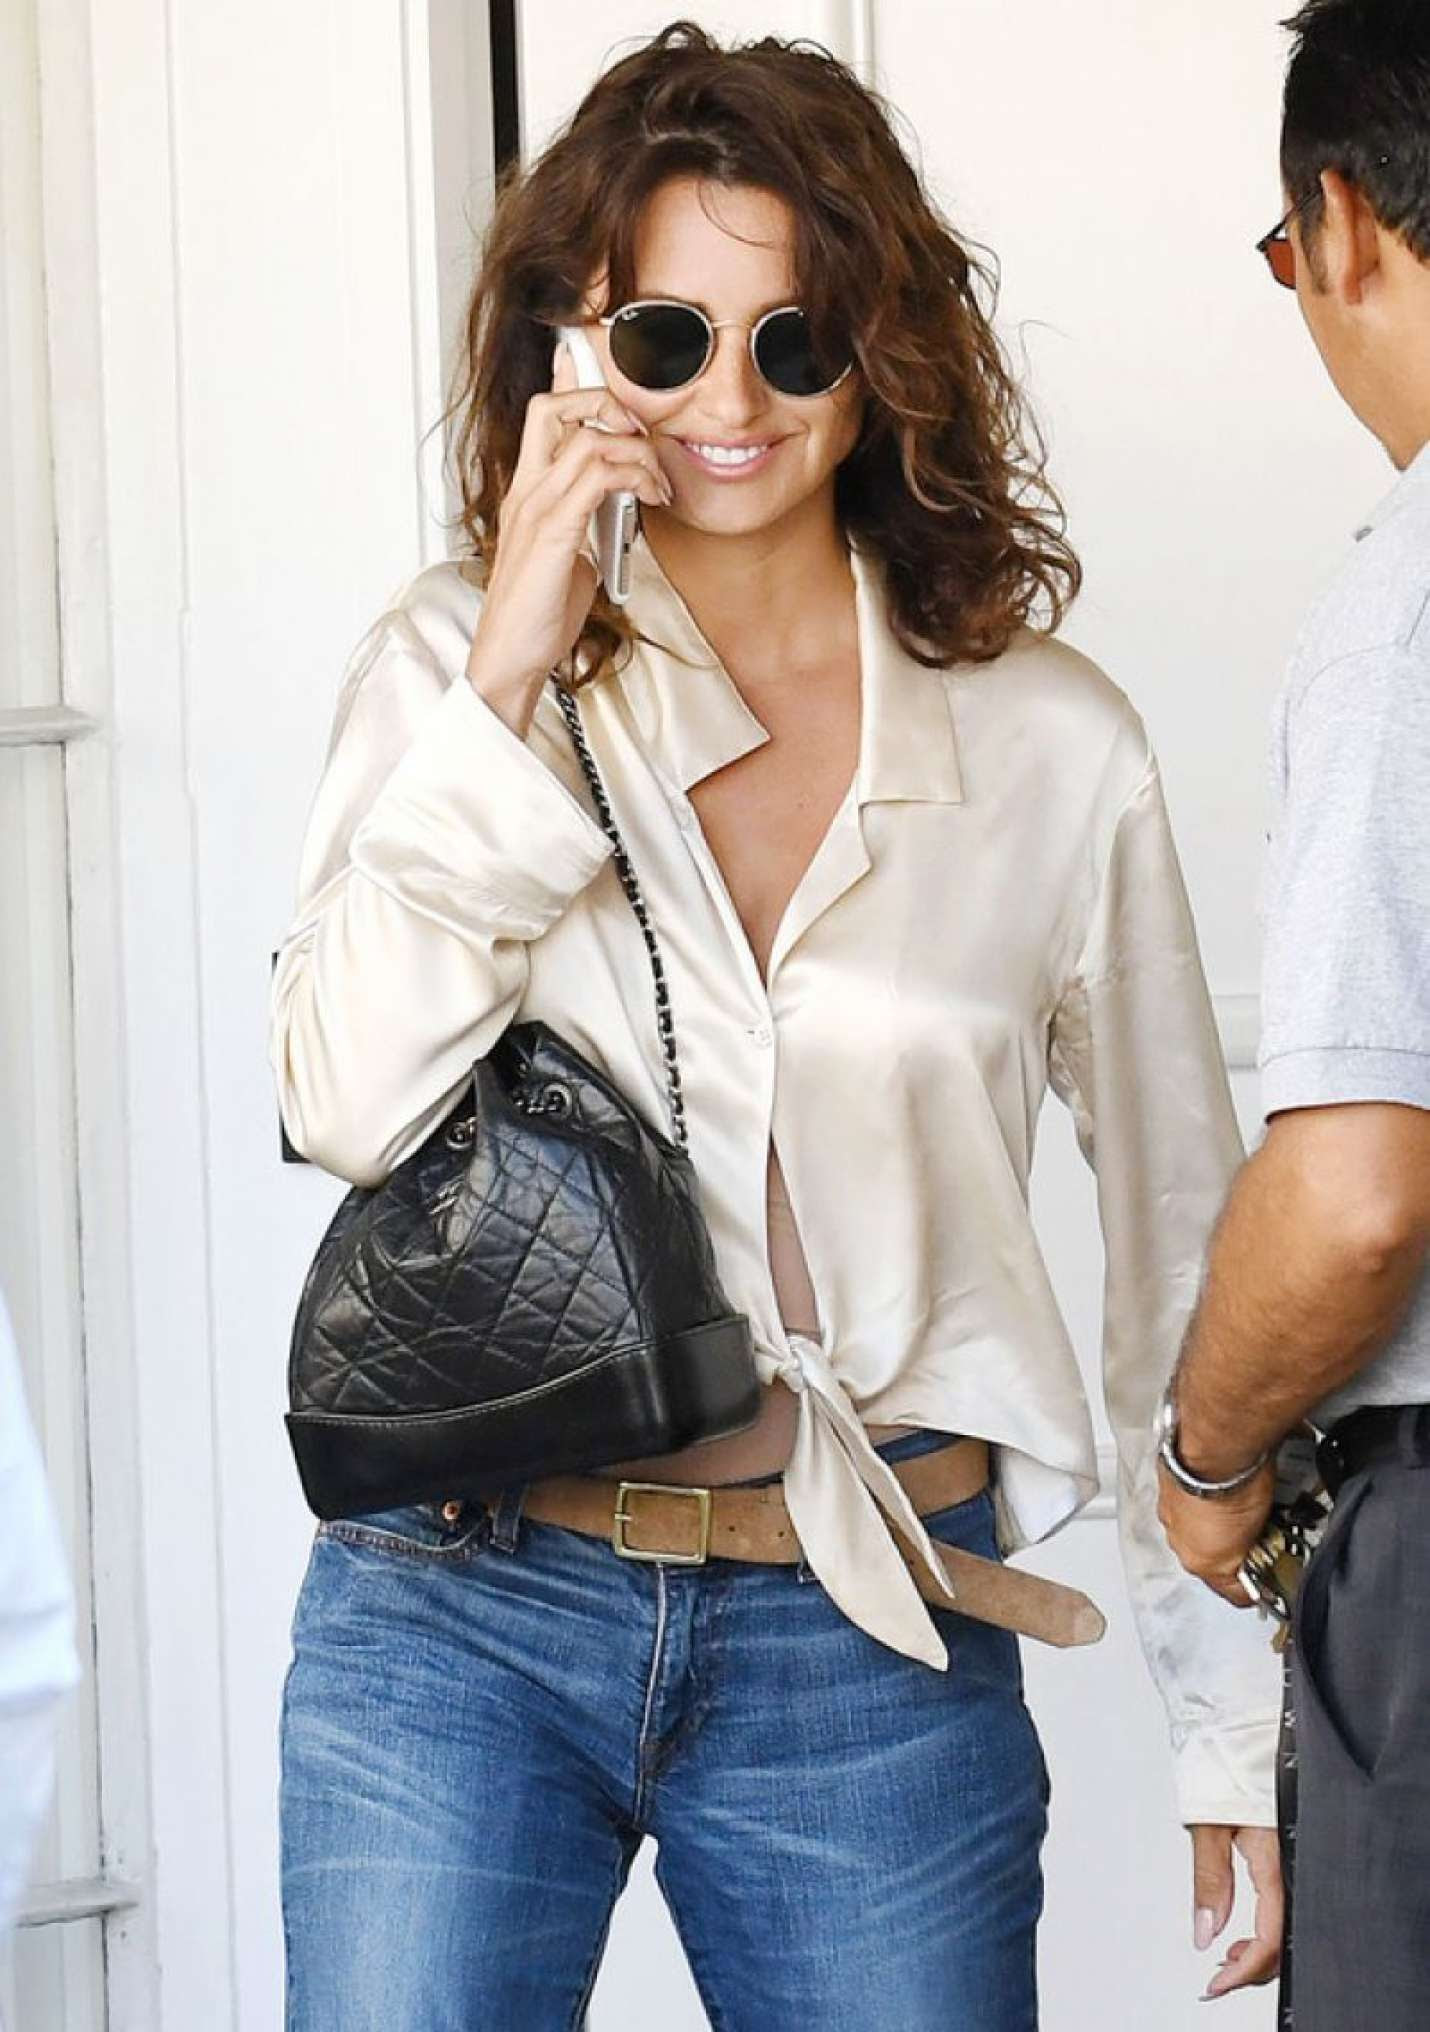 Penelope Cruz in Jeans out in Los Angeles